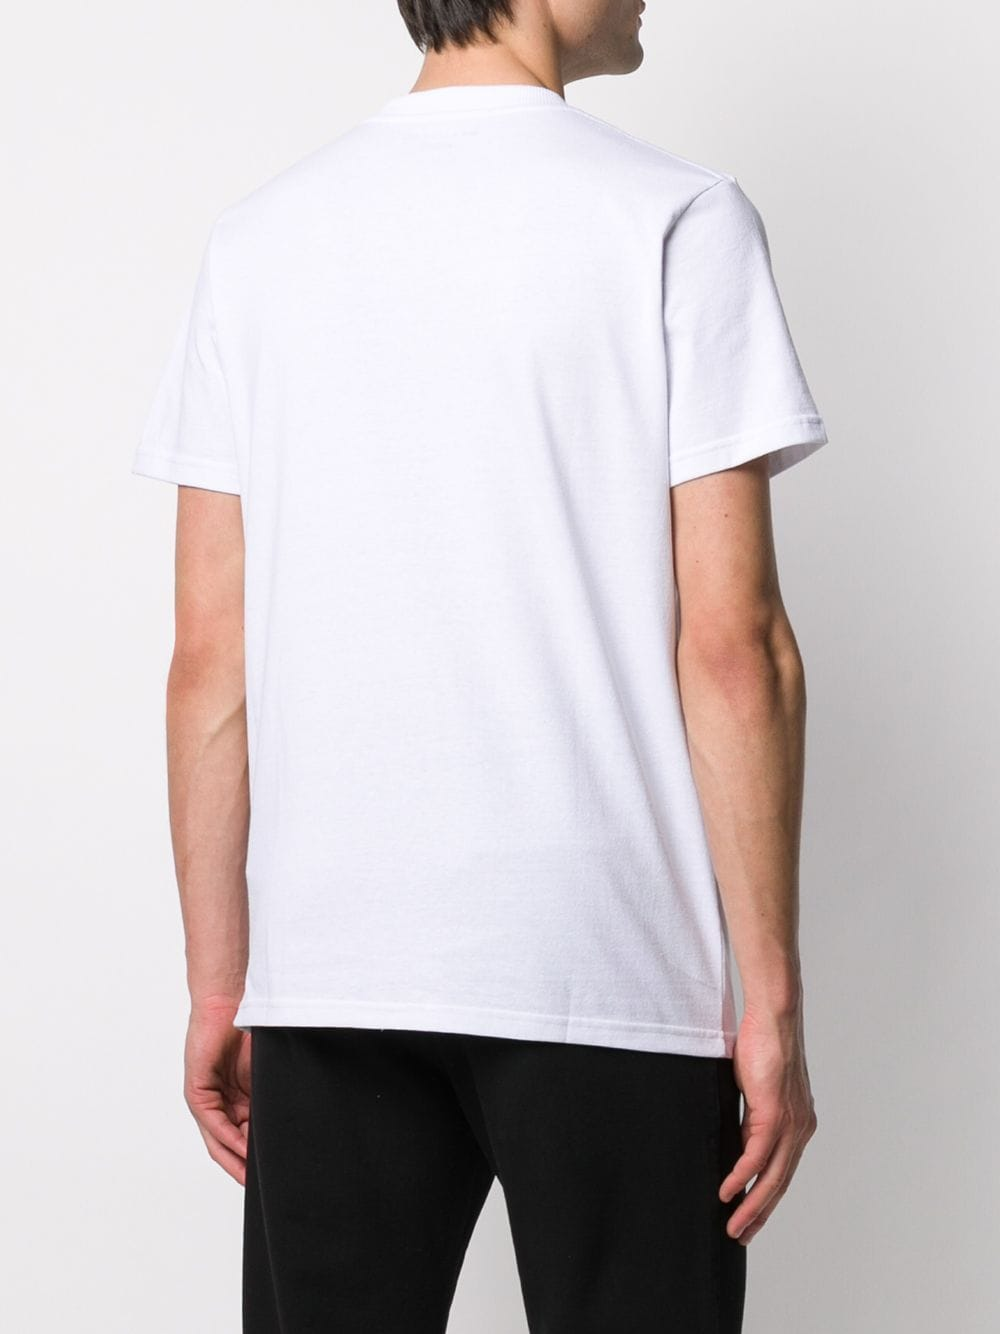 1017 Alyx 9sm tripack t-shirt unisex bianco 1017 ALYX 9SM | T-shirt | AVUTS0024FA01WTH0001